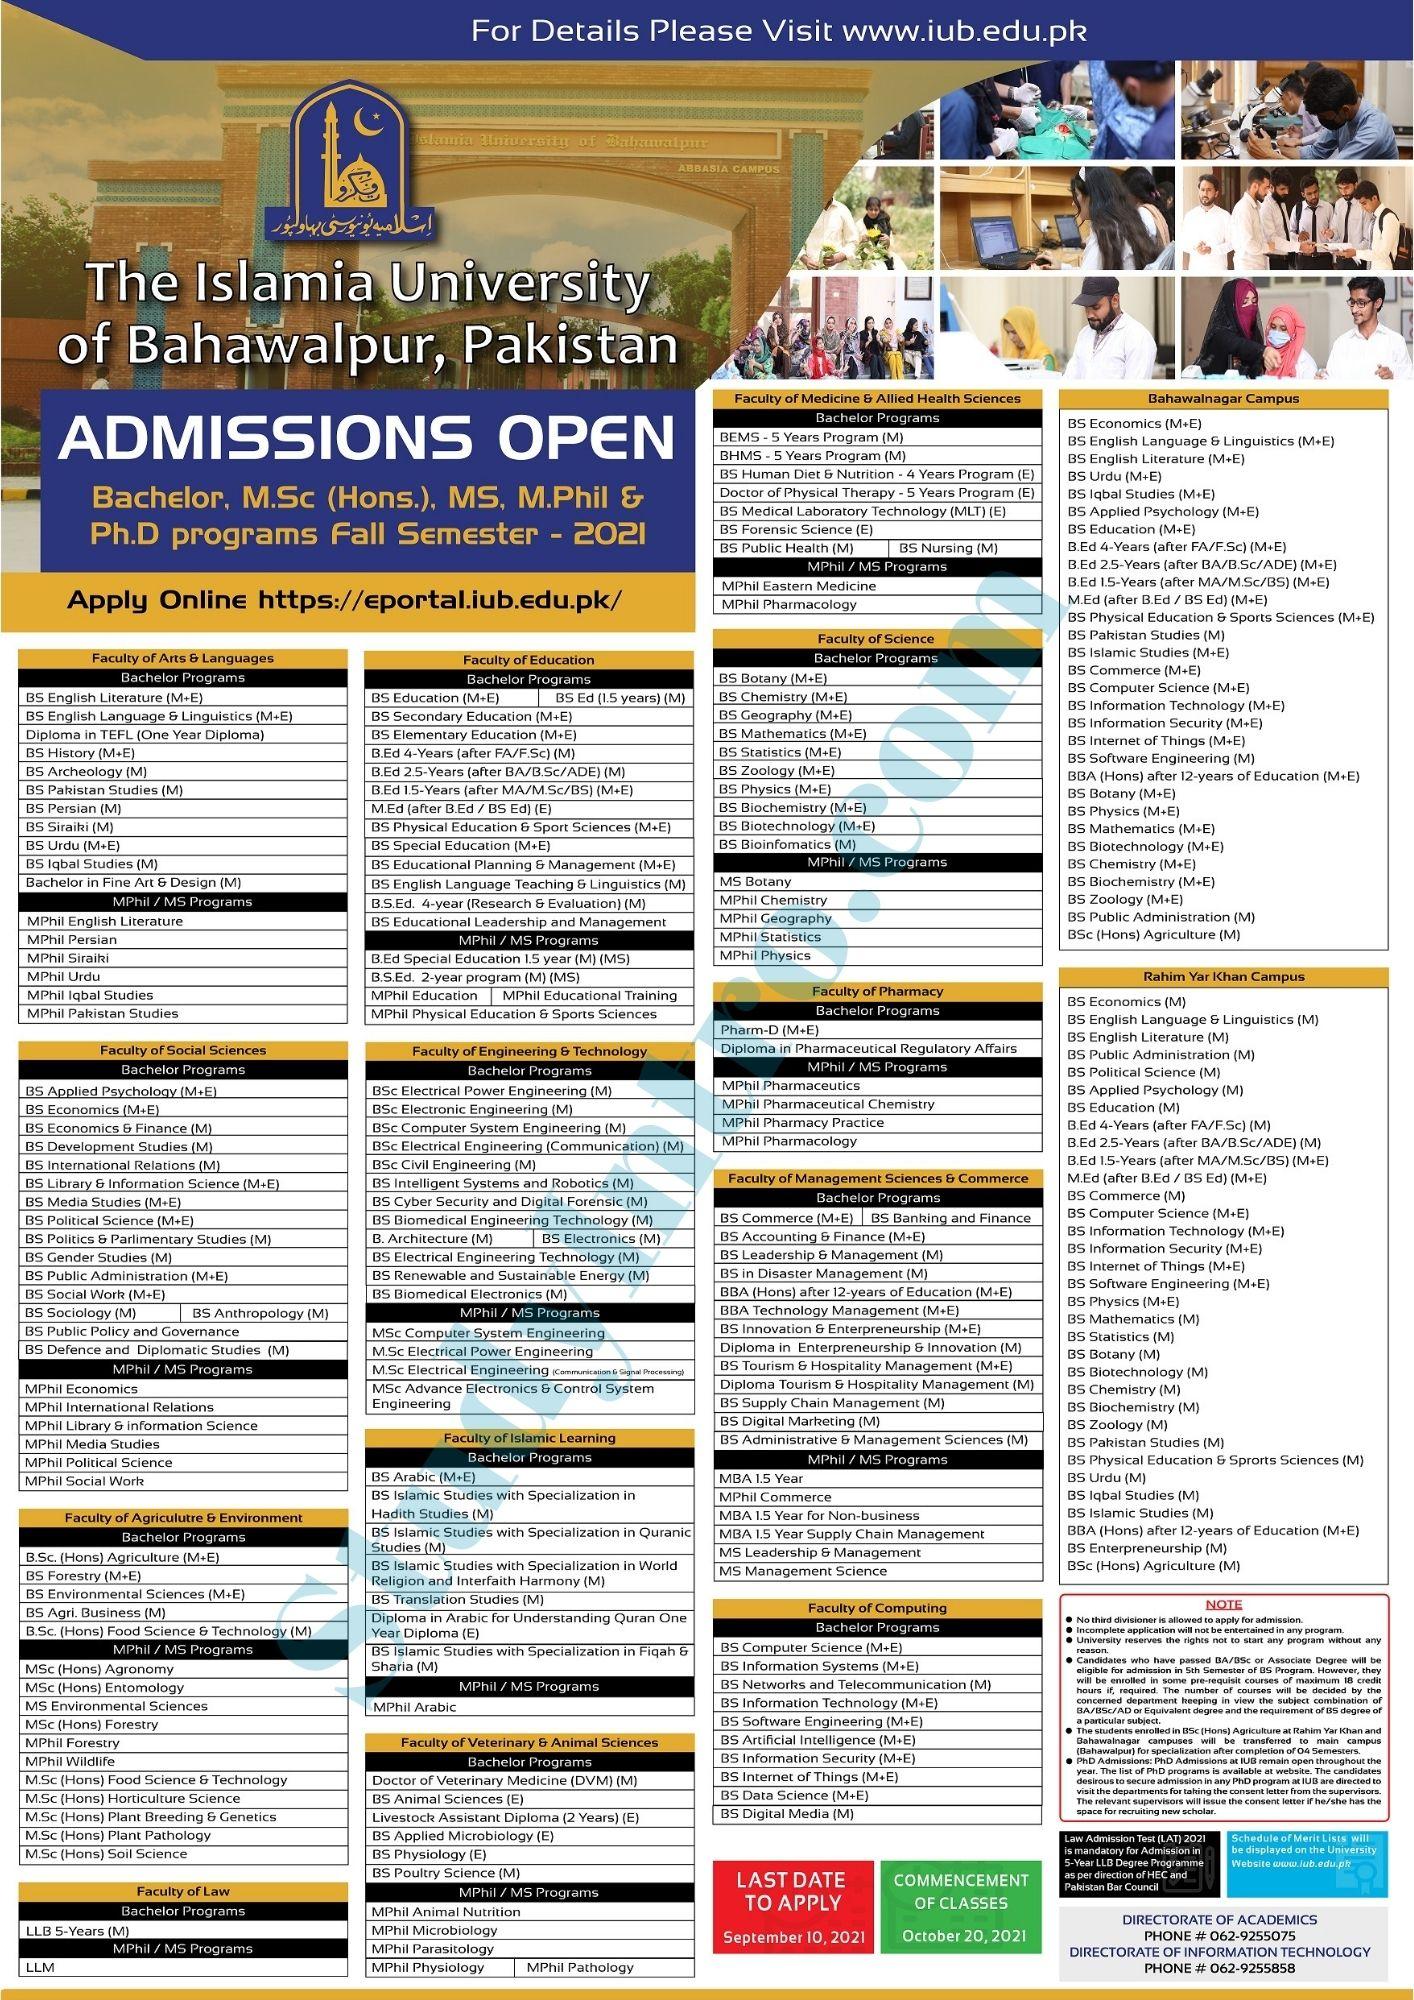 Admissions Open in IUB (Islamia University Bahawalpur) Fall 2021